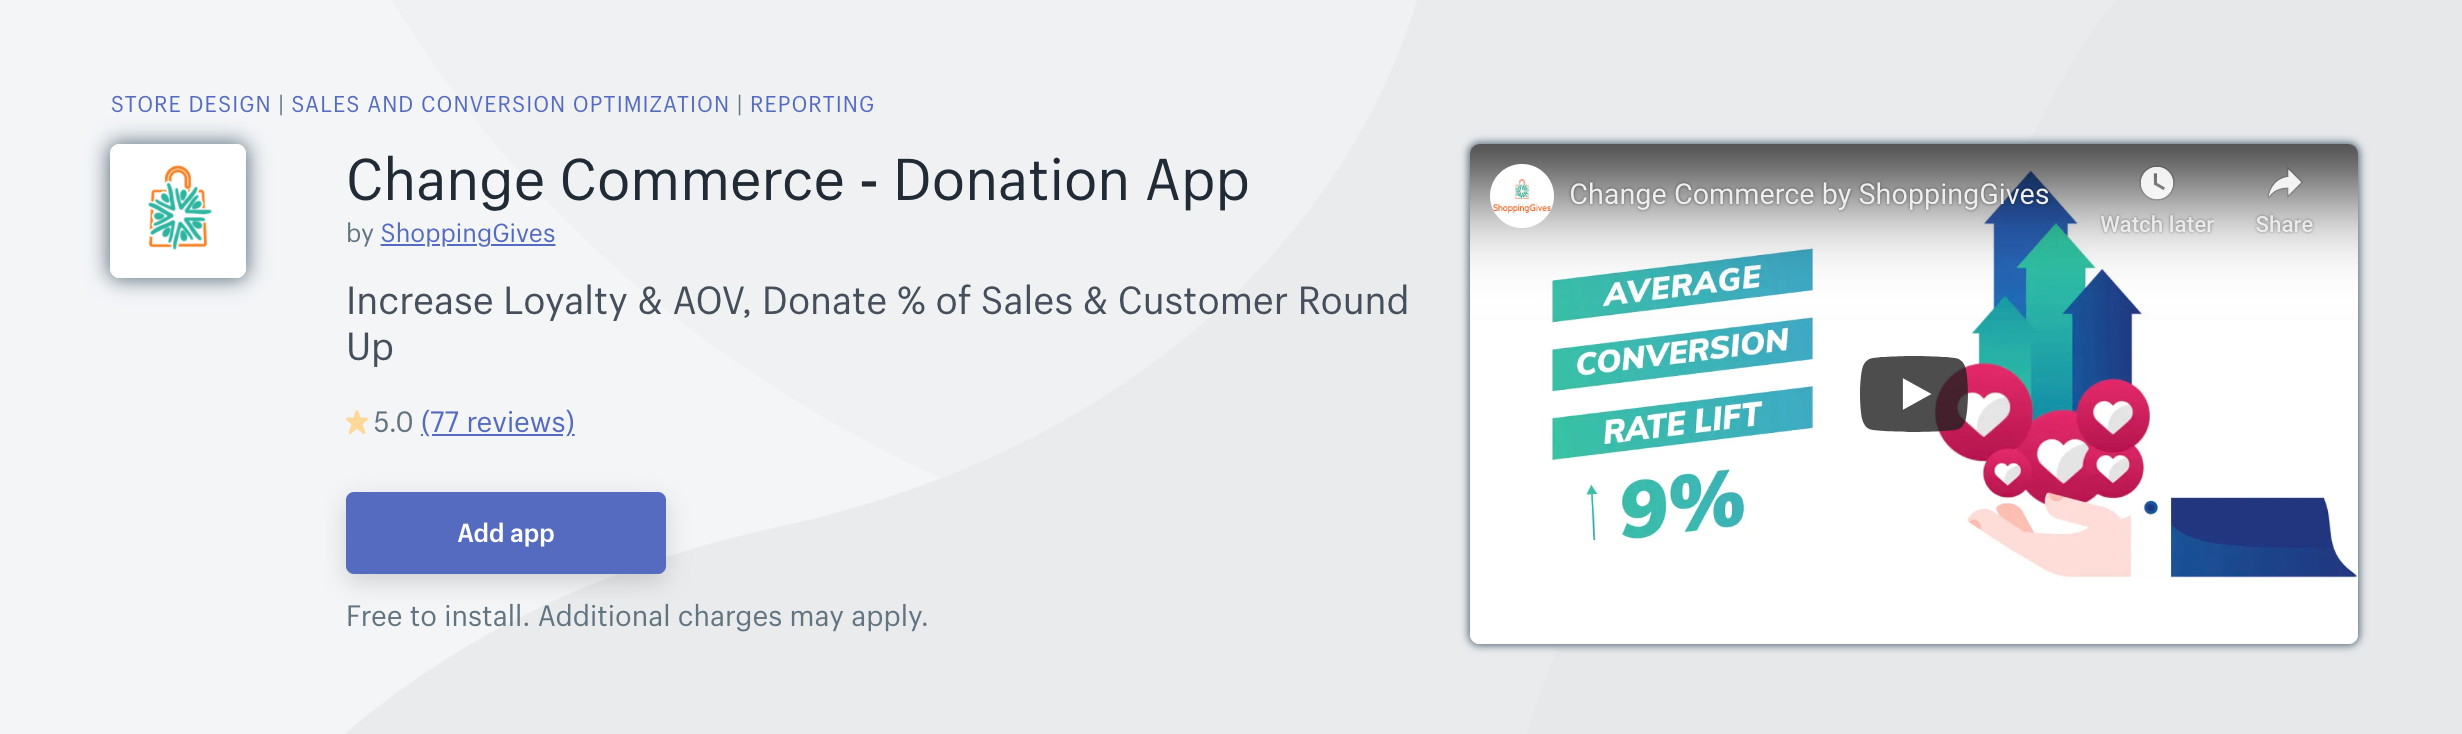 Change Commerce - Donation App